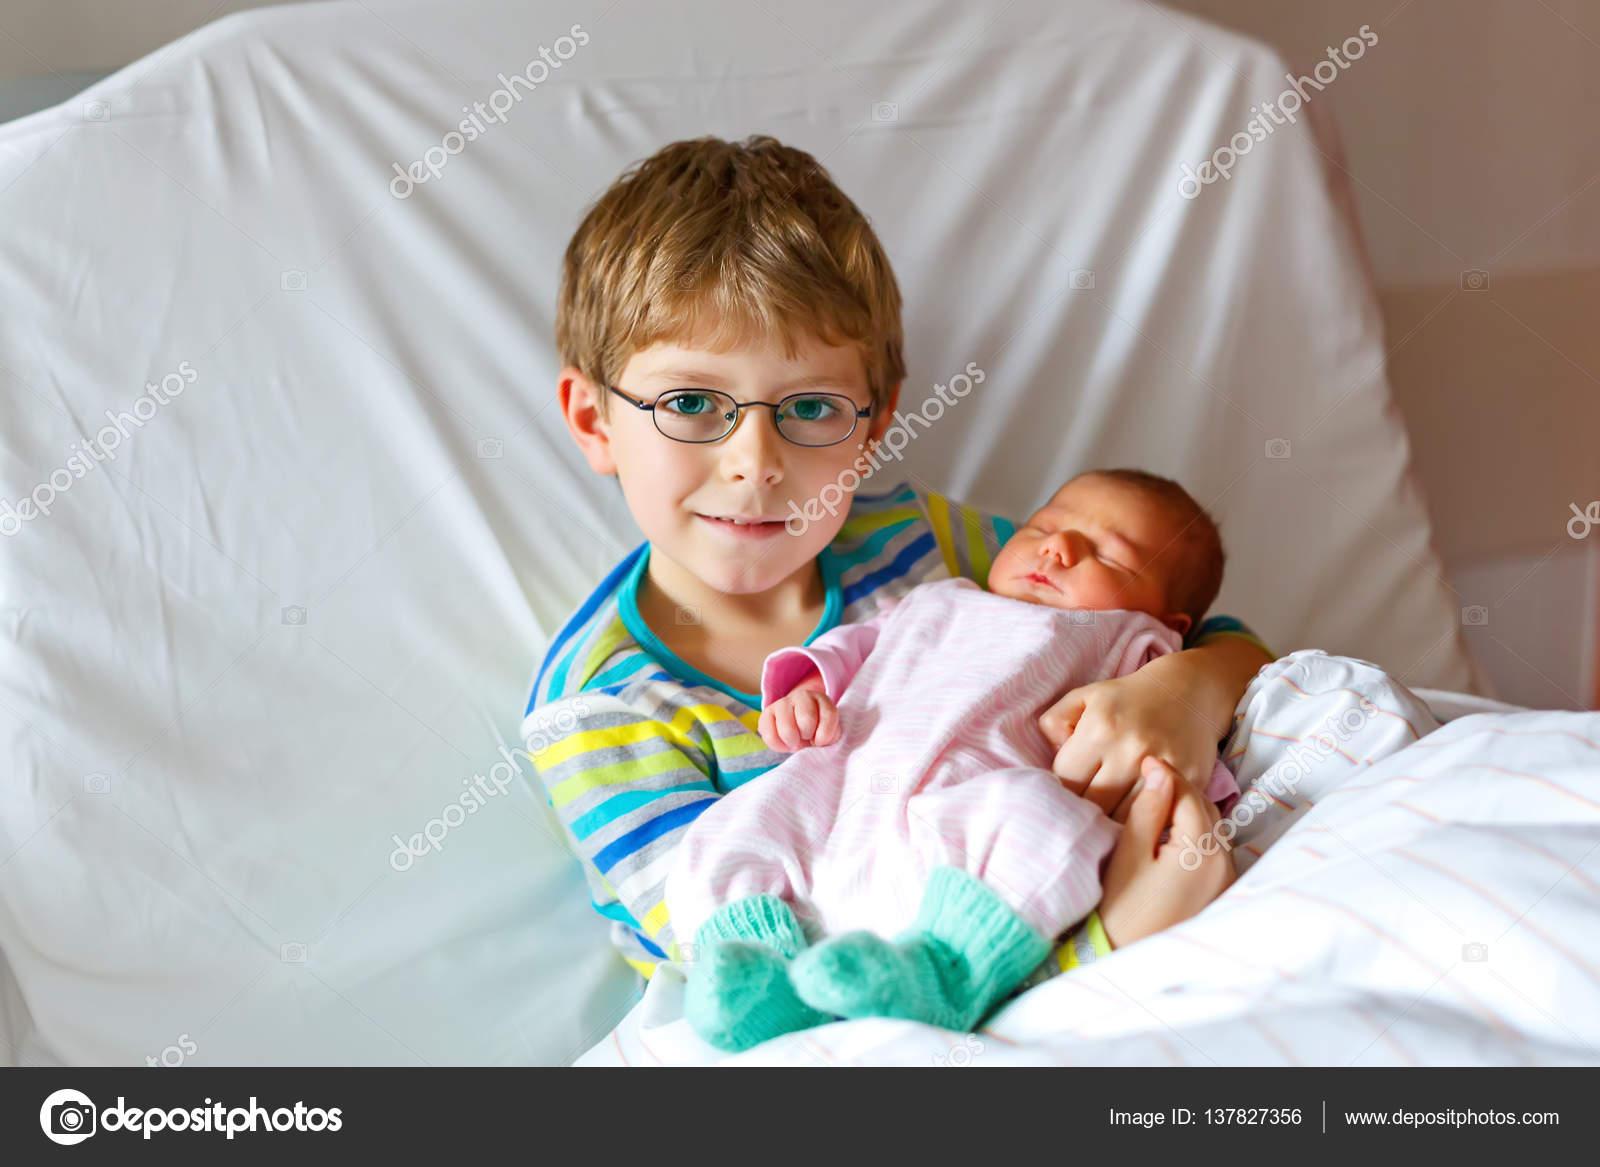 a58c2fc76ed3a Little kid boy holding his sleeping newborn baby sister in hospital ...